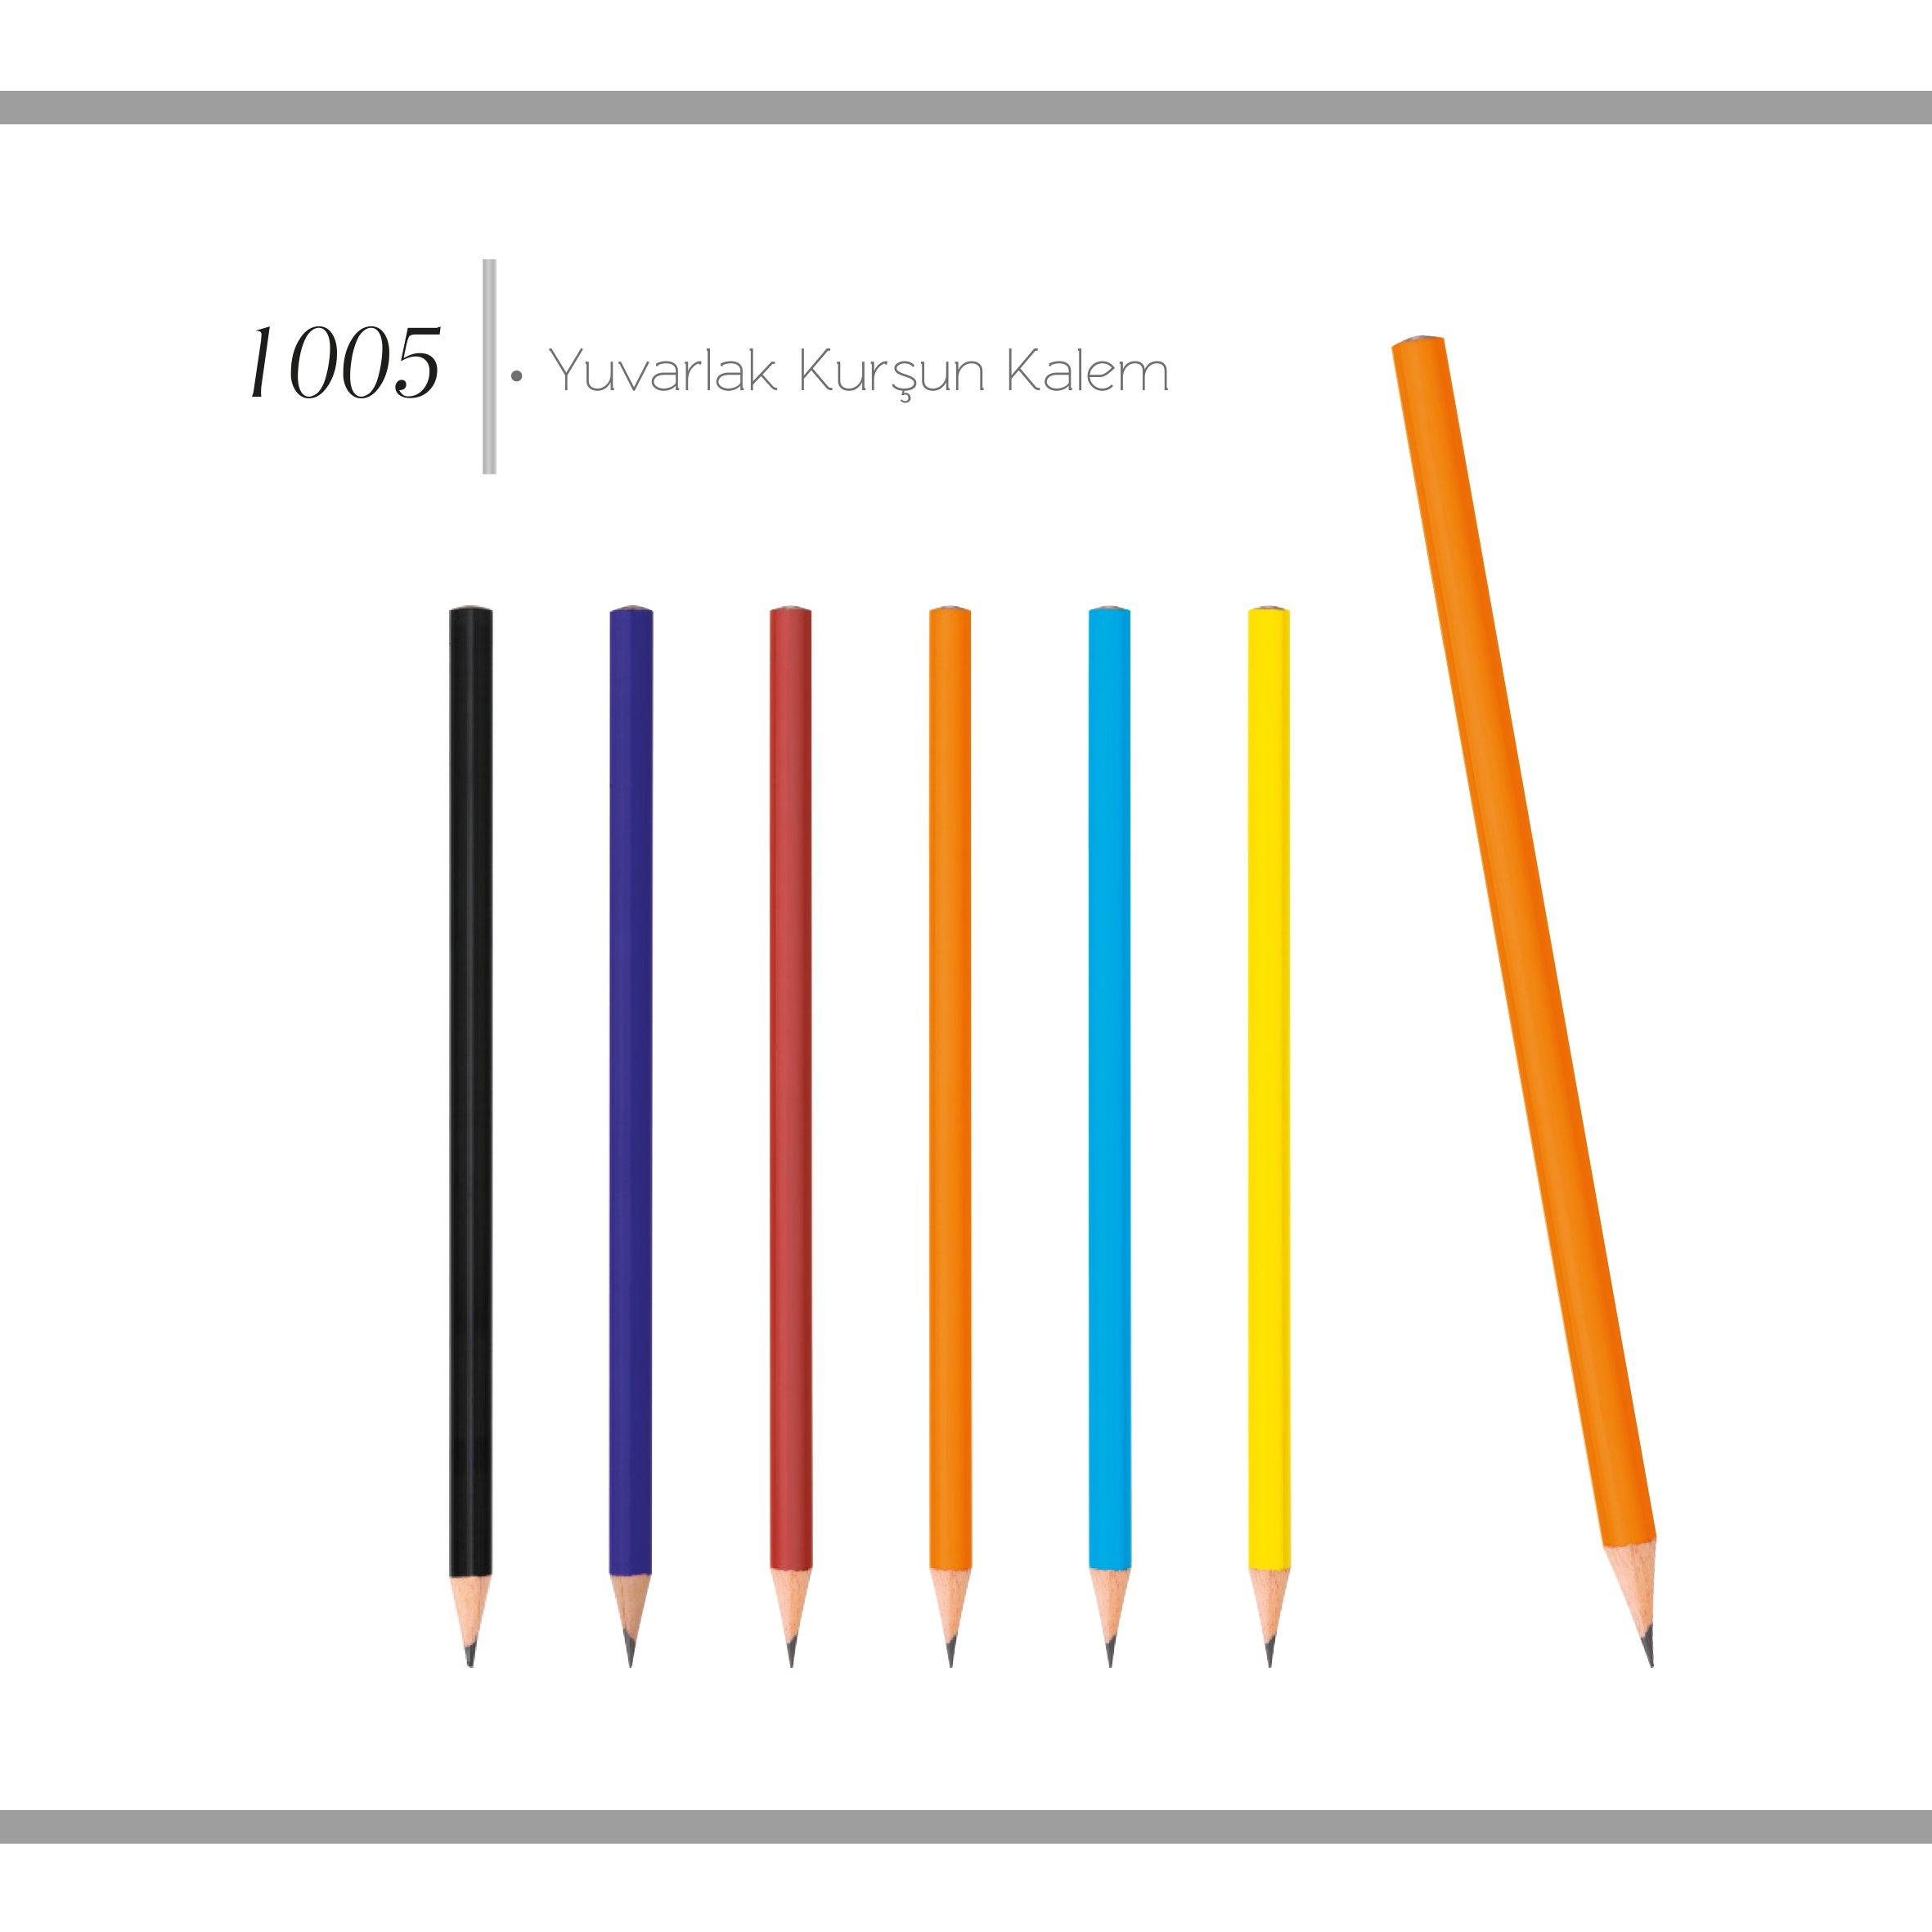 promosyon-promosyon ürünleri-promosyon kalemler-kurşun kalemler-promosyon ahşap kurşun kalem 1005